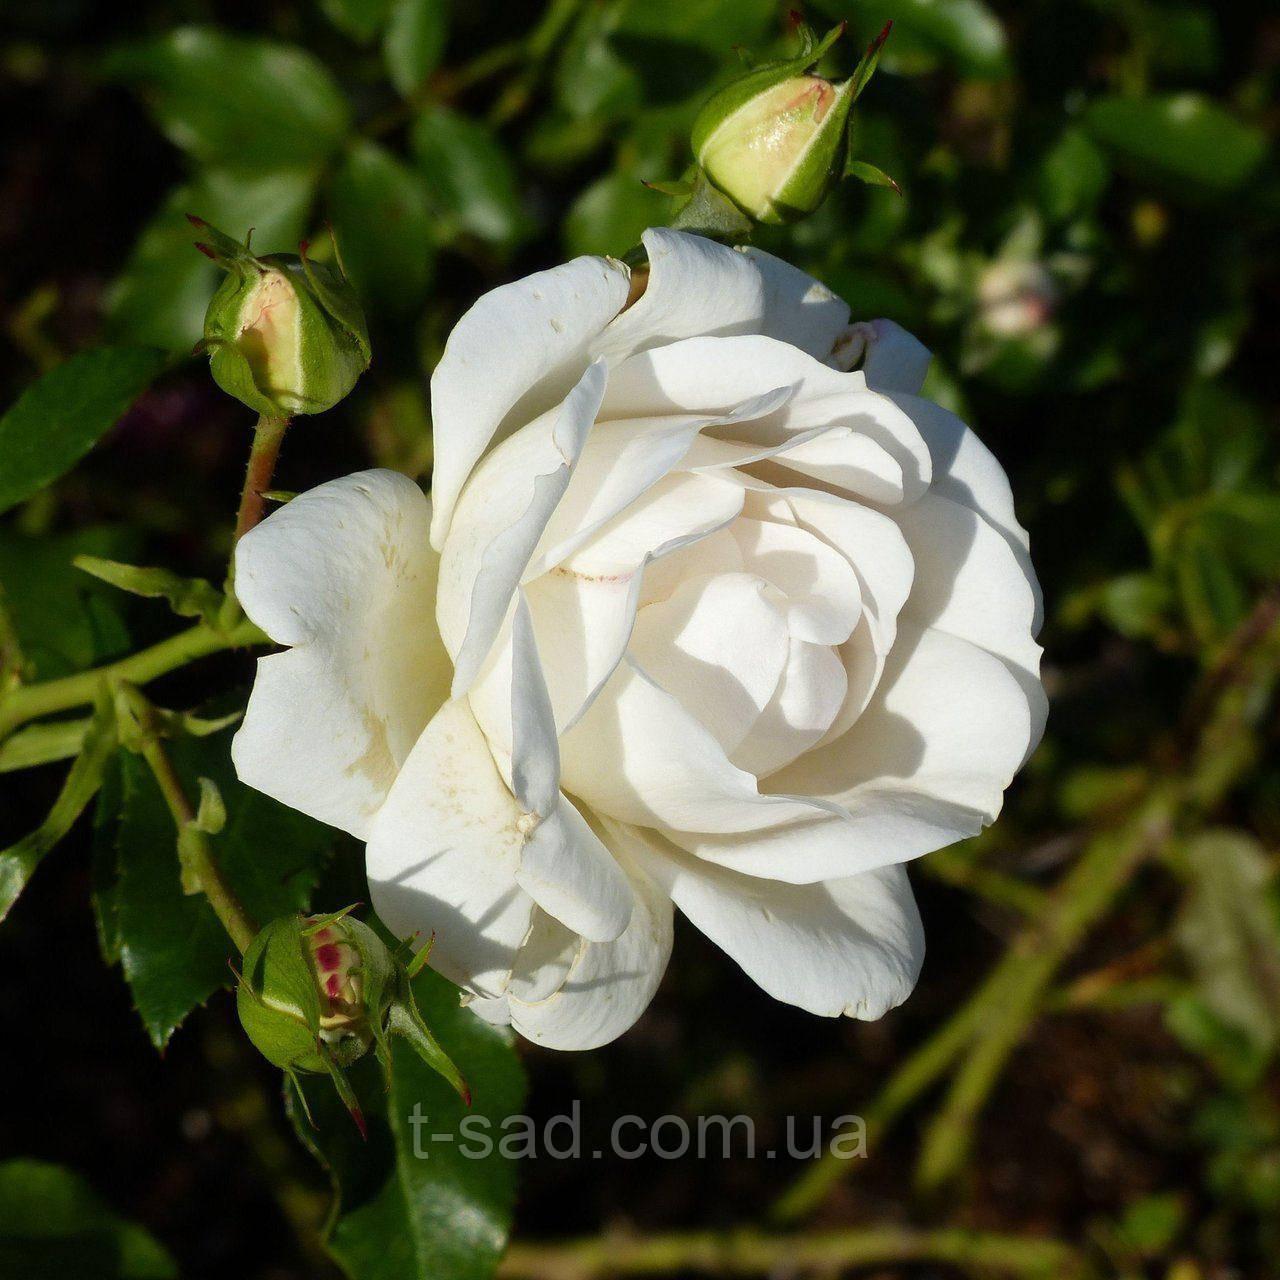 Роза Карт Бланш (Carte Blanche)